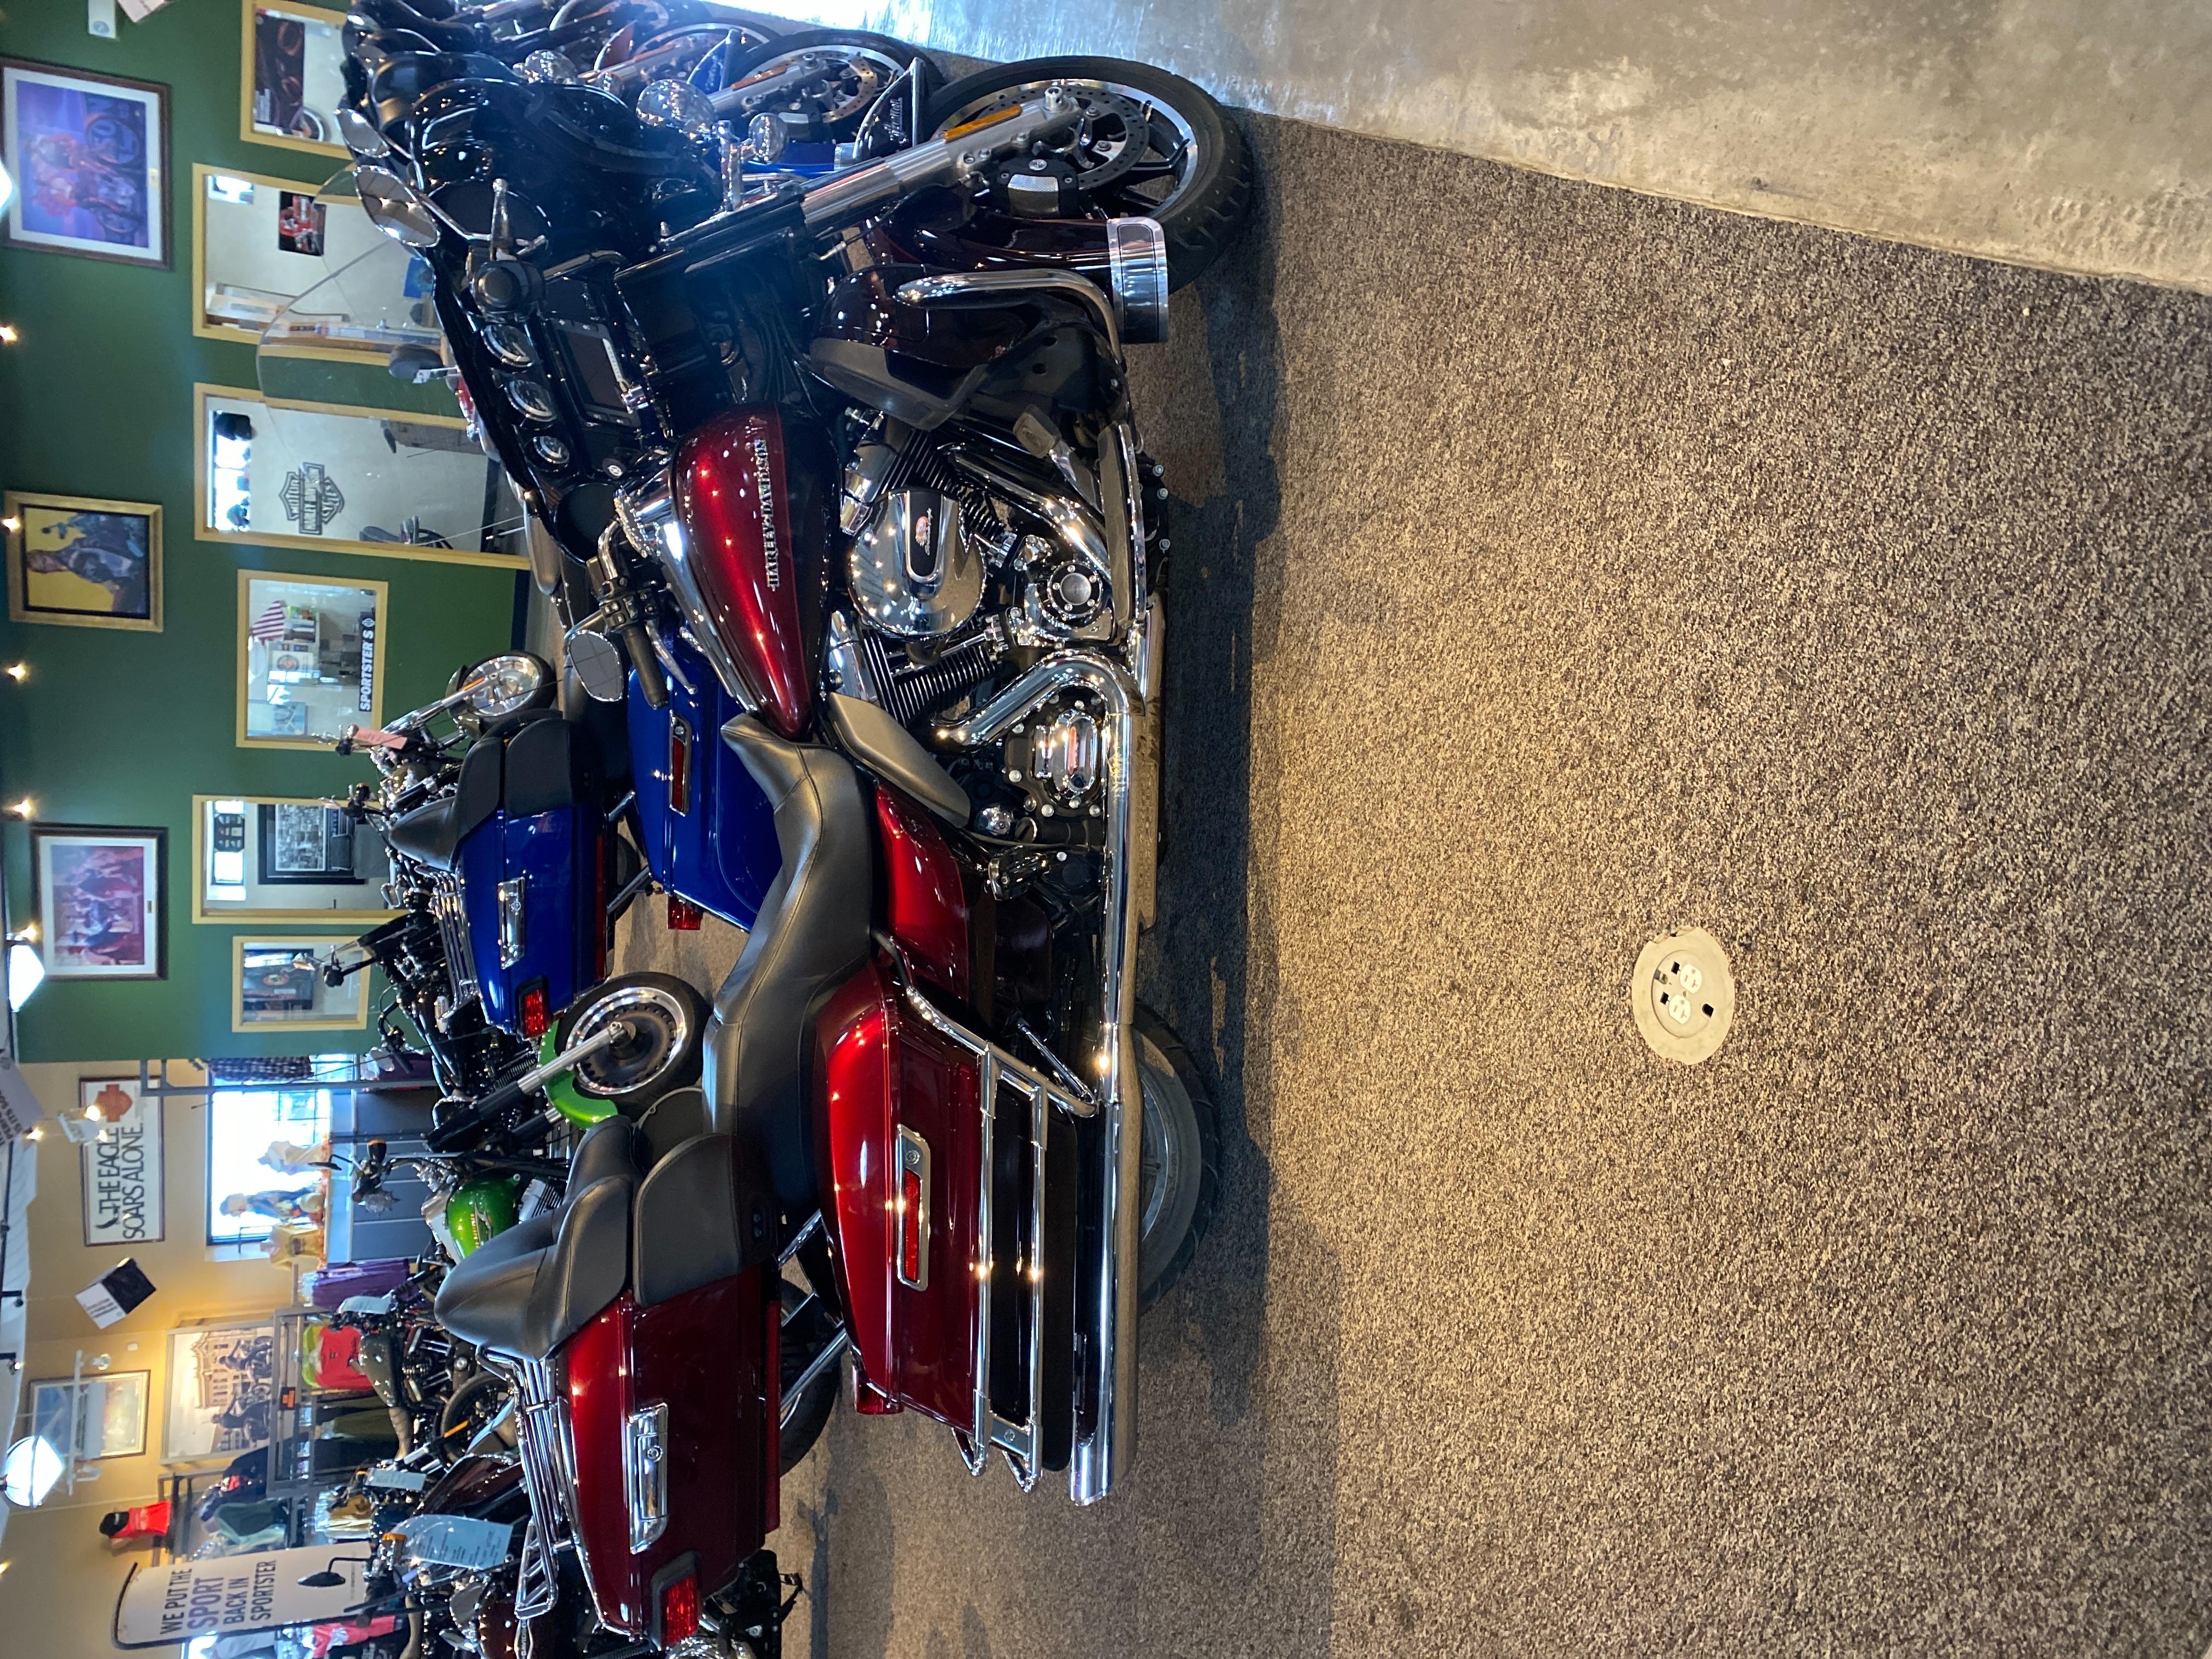 2015 Harley-Davidson Electra Glide Ultra Limited Low at Outpost Harley-Davidson